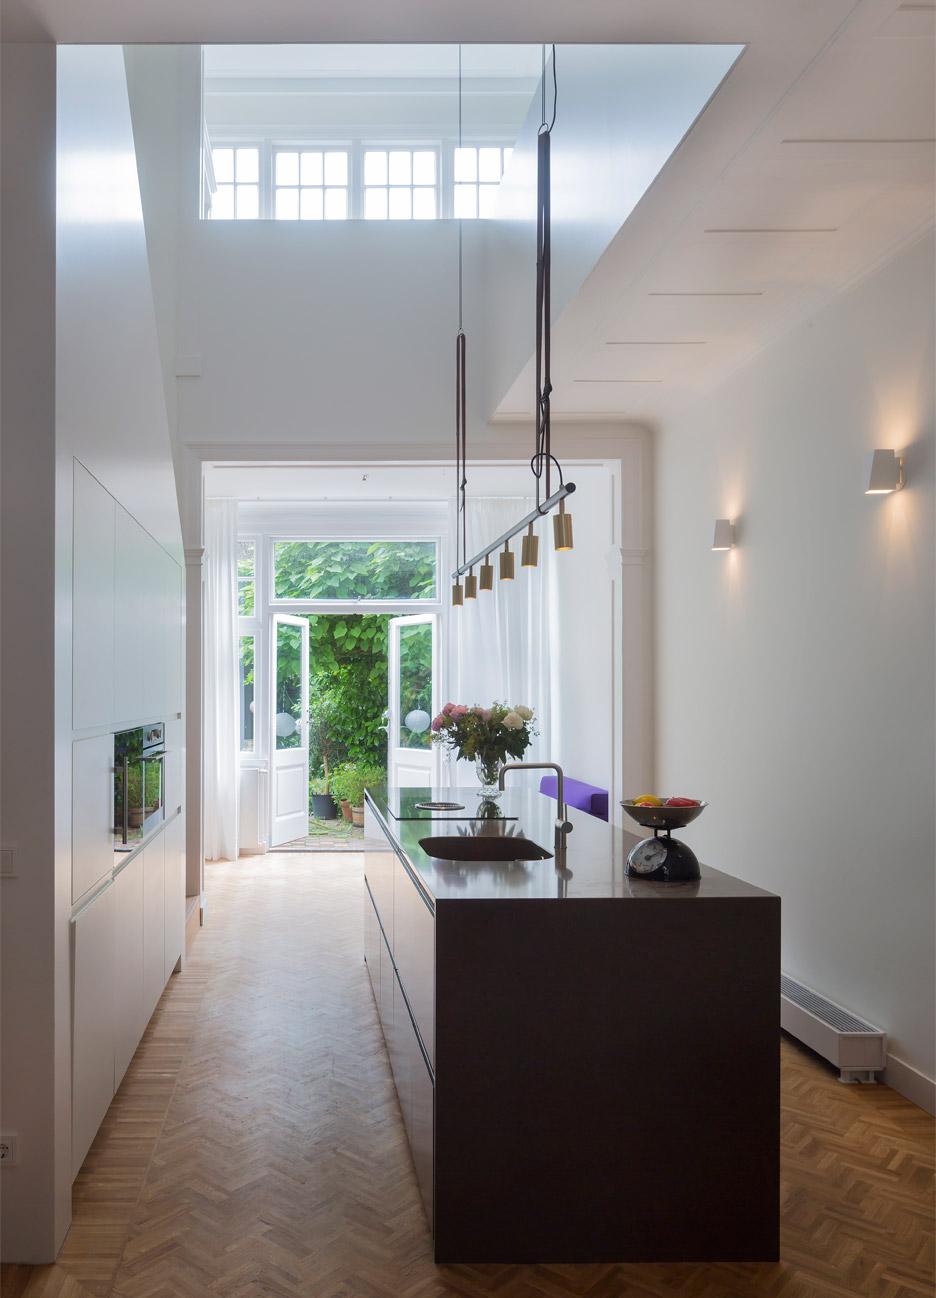 architecture_renovation_project_hague-interior_house__design_studia_interiors_osnovadesign_osnova_poltava_07